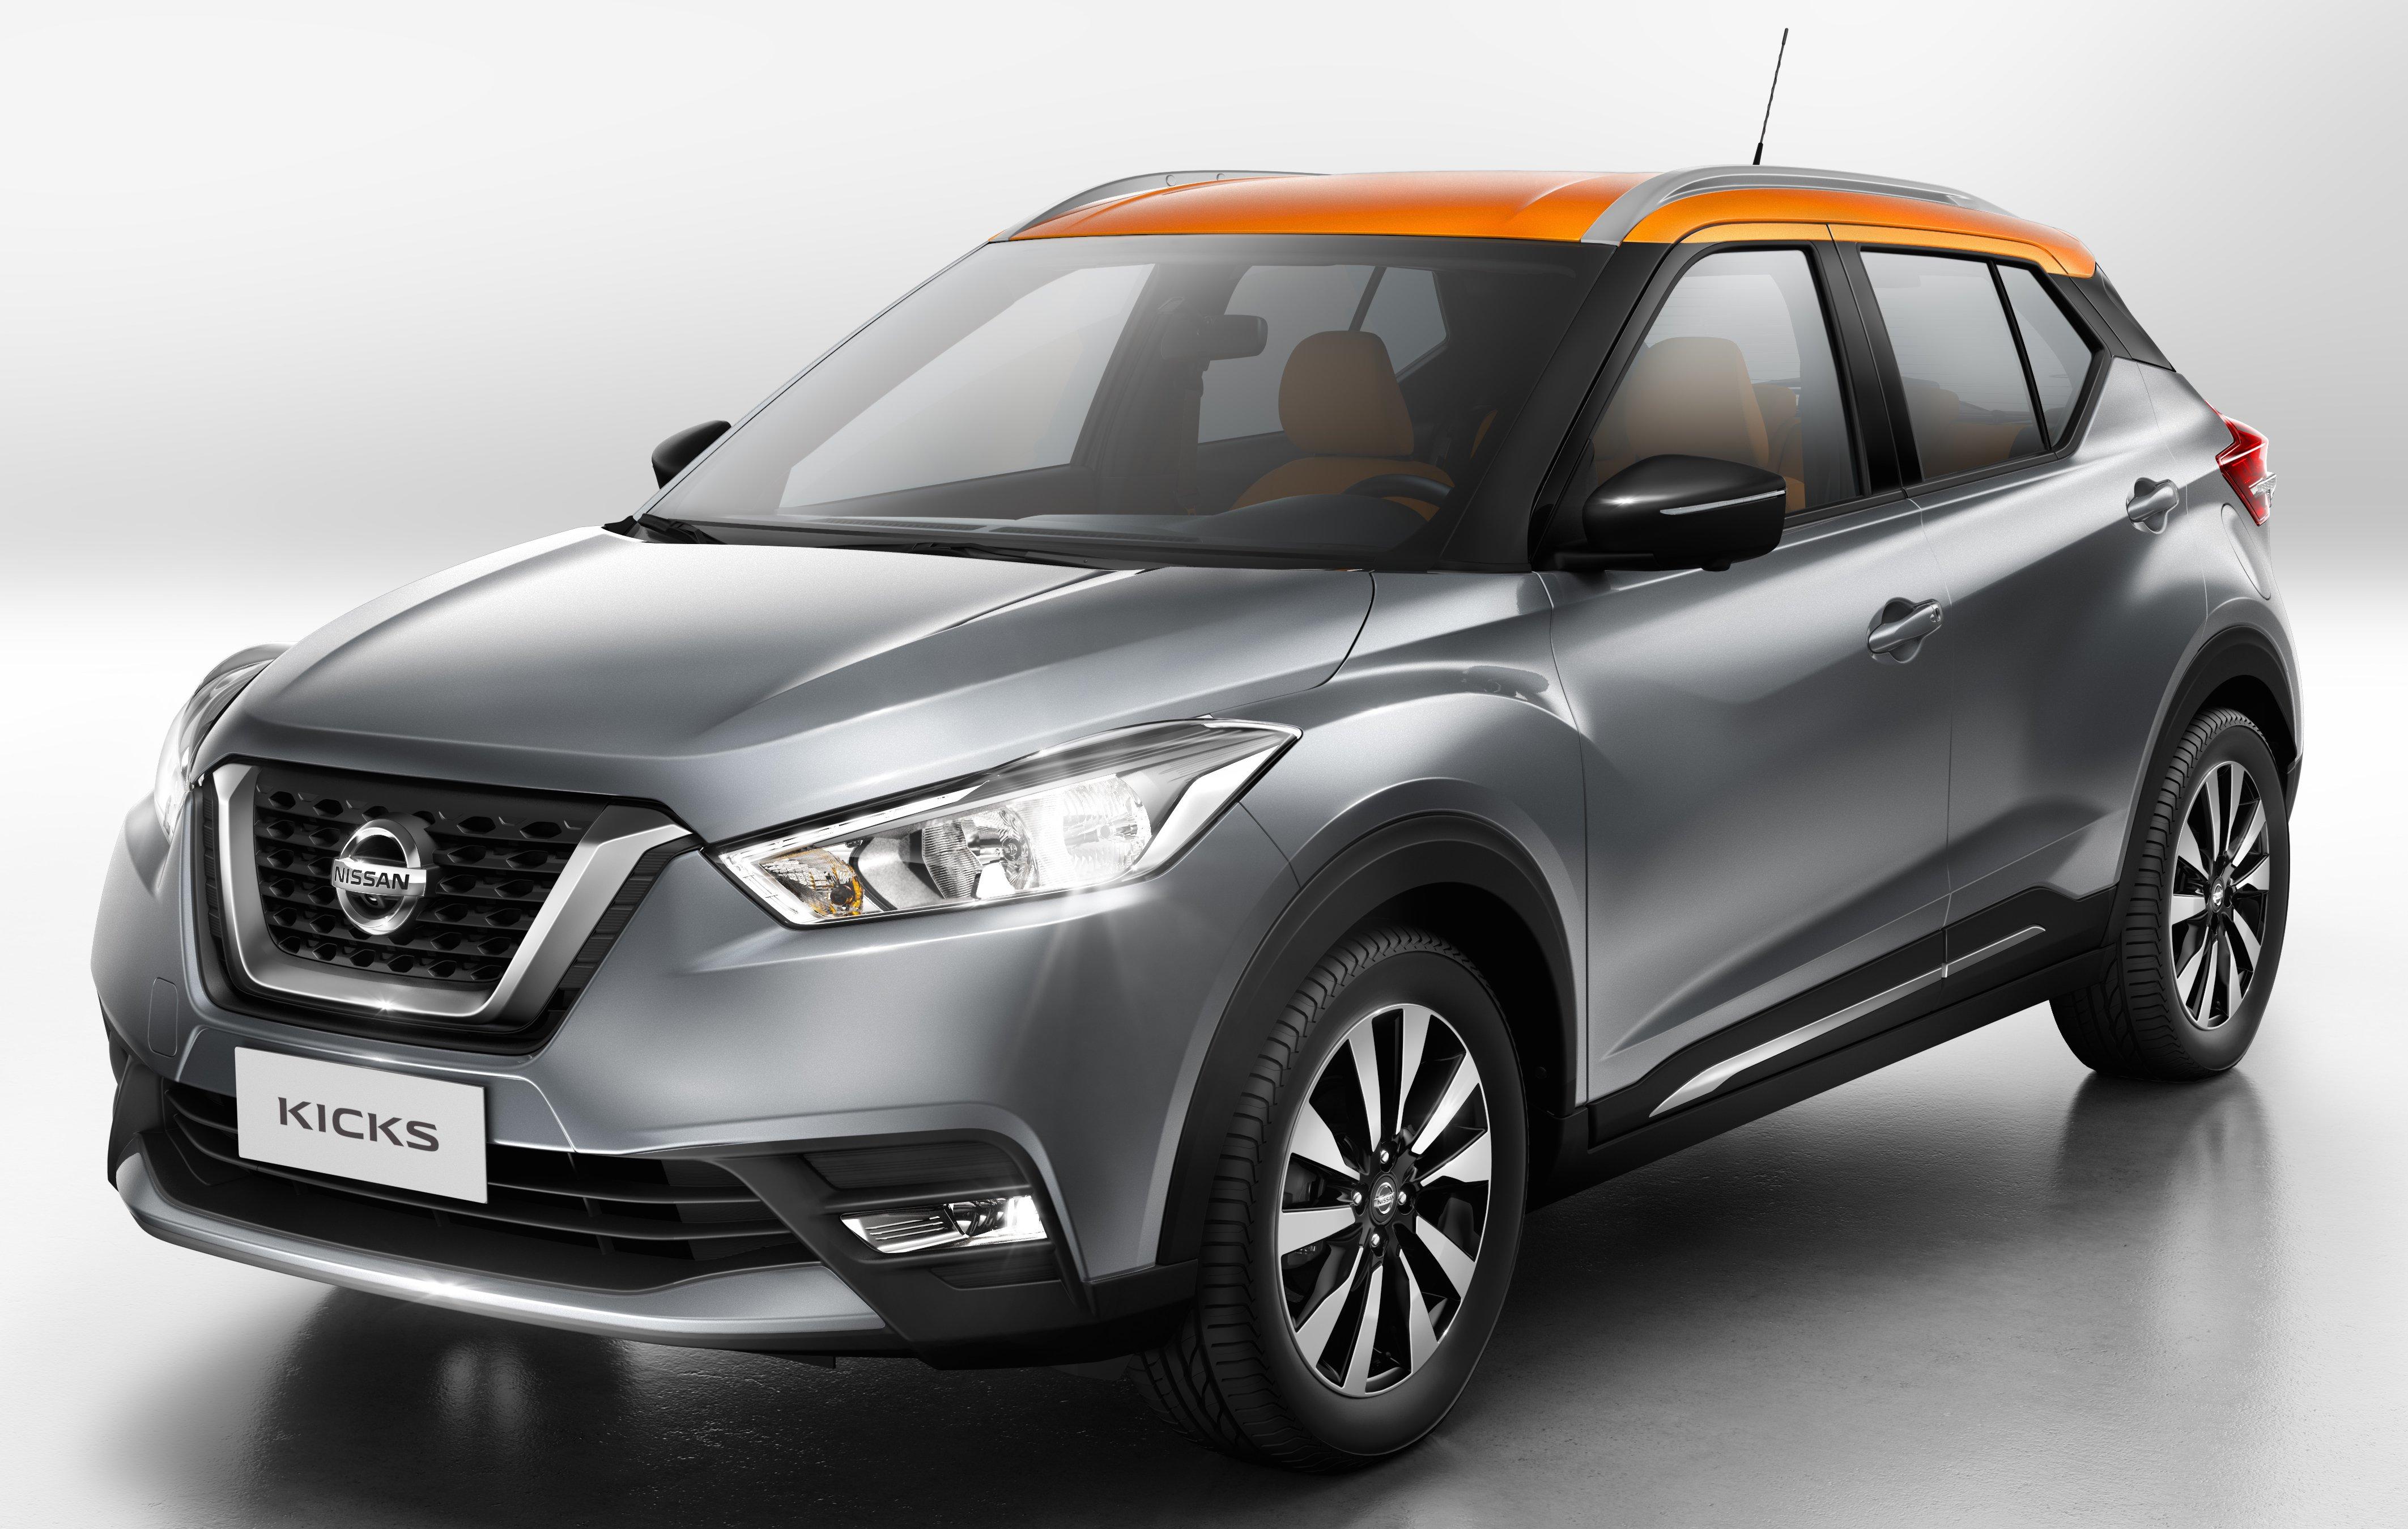 Nissan Kicks debuts - new Honda HR-V rival detailed